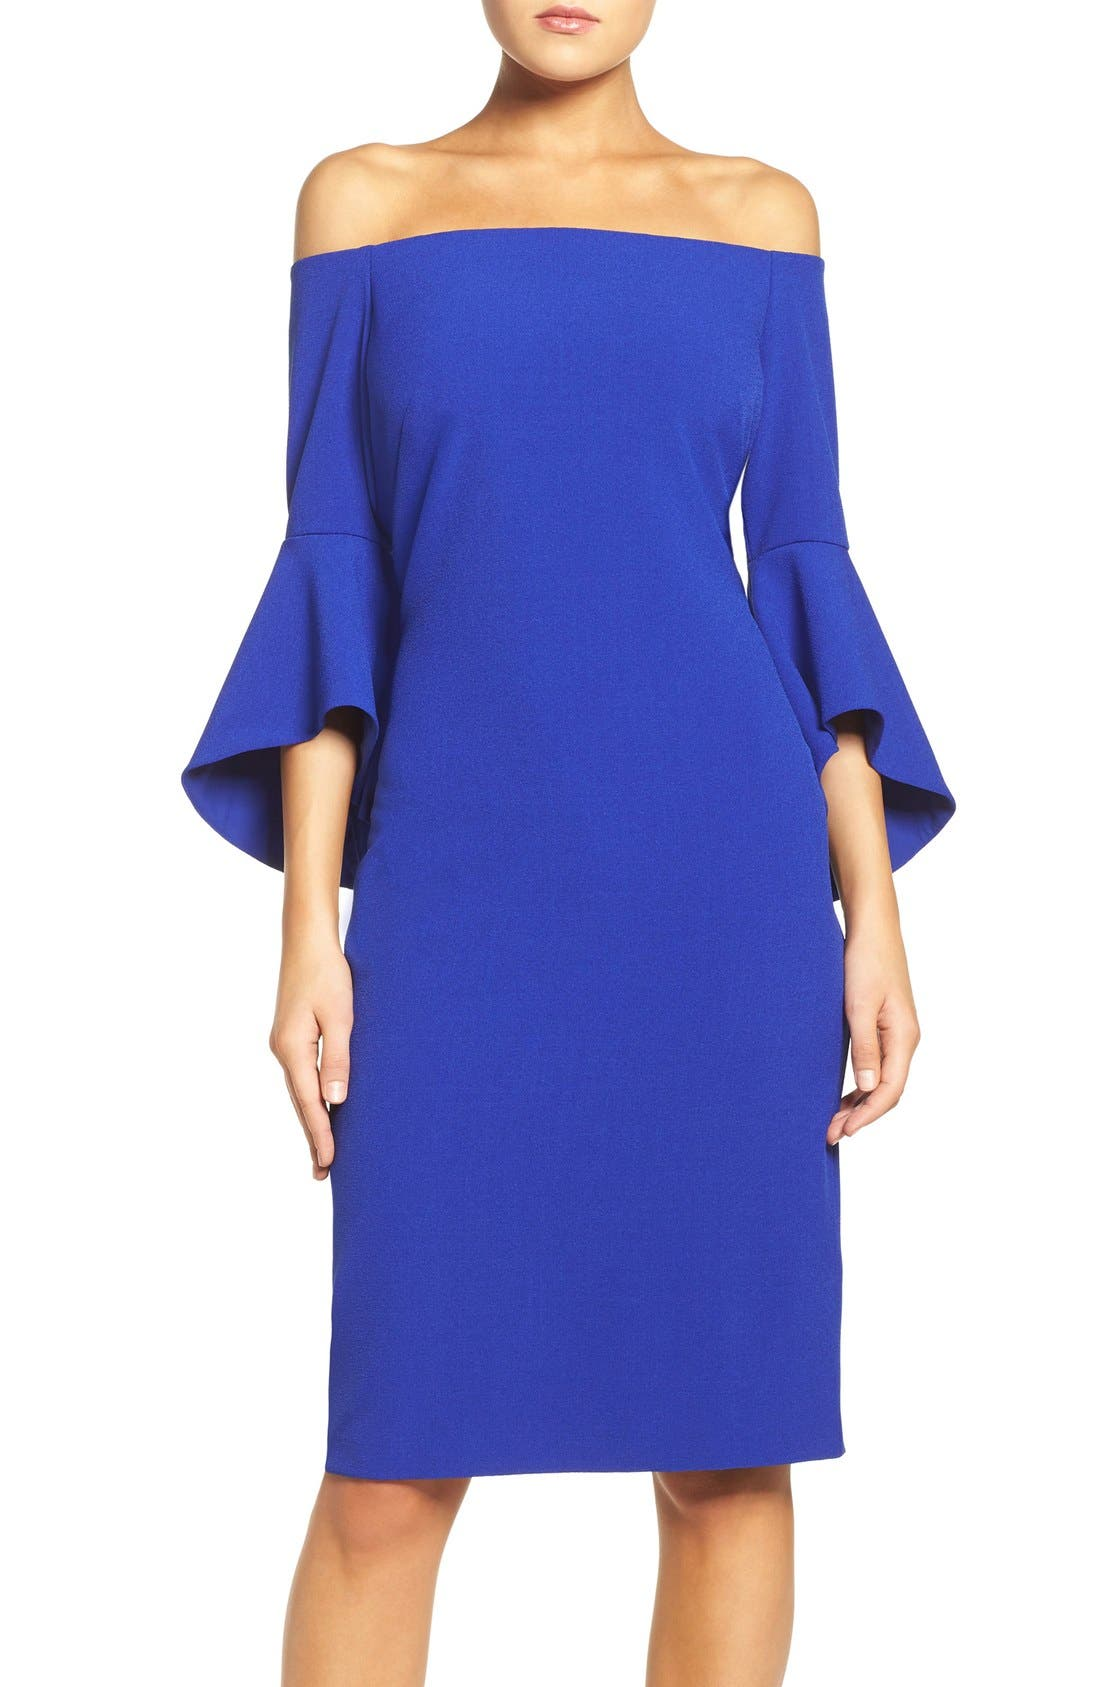 61792d8ec8e1 Women s Chelsea28 Dresses